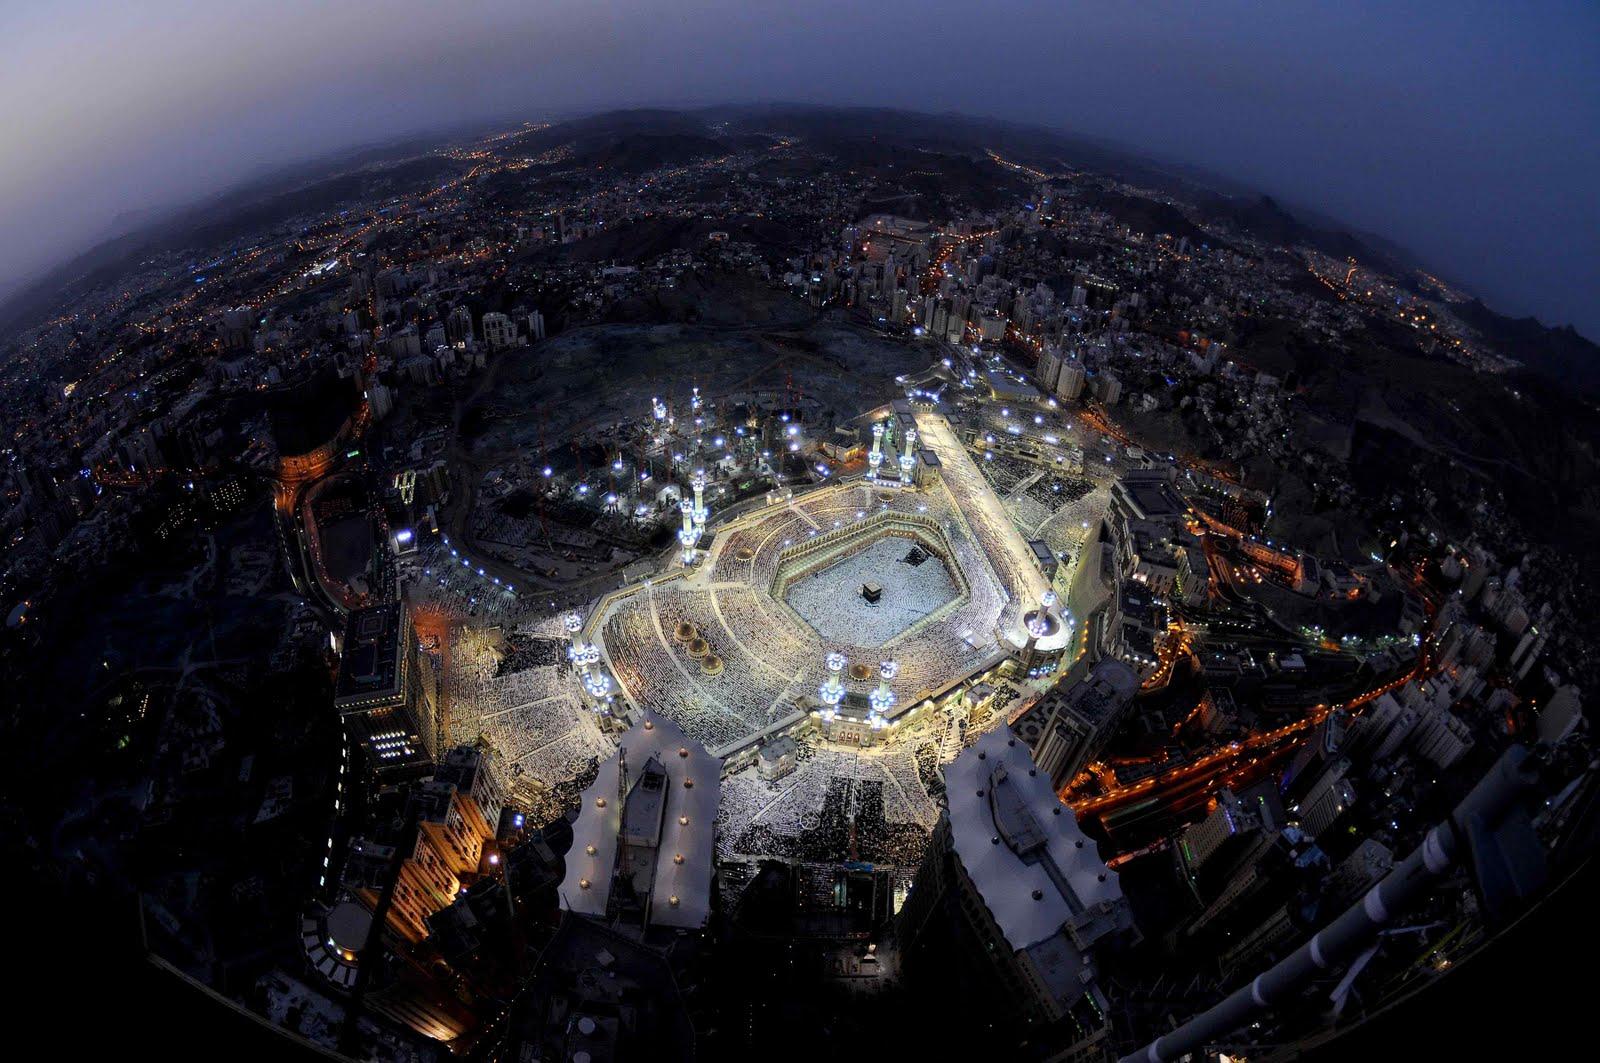 http://3.bp.blogspot.com/_1F-5yioDoJ0/TQefAbdxxHI/AAAAAAAAAas/-wh9D58DgAc/s1600/makkah+aerial.jpg